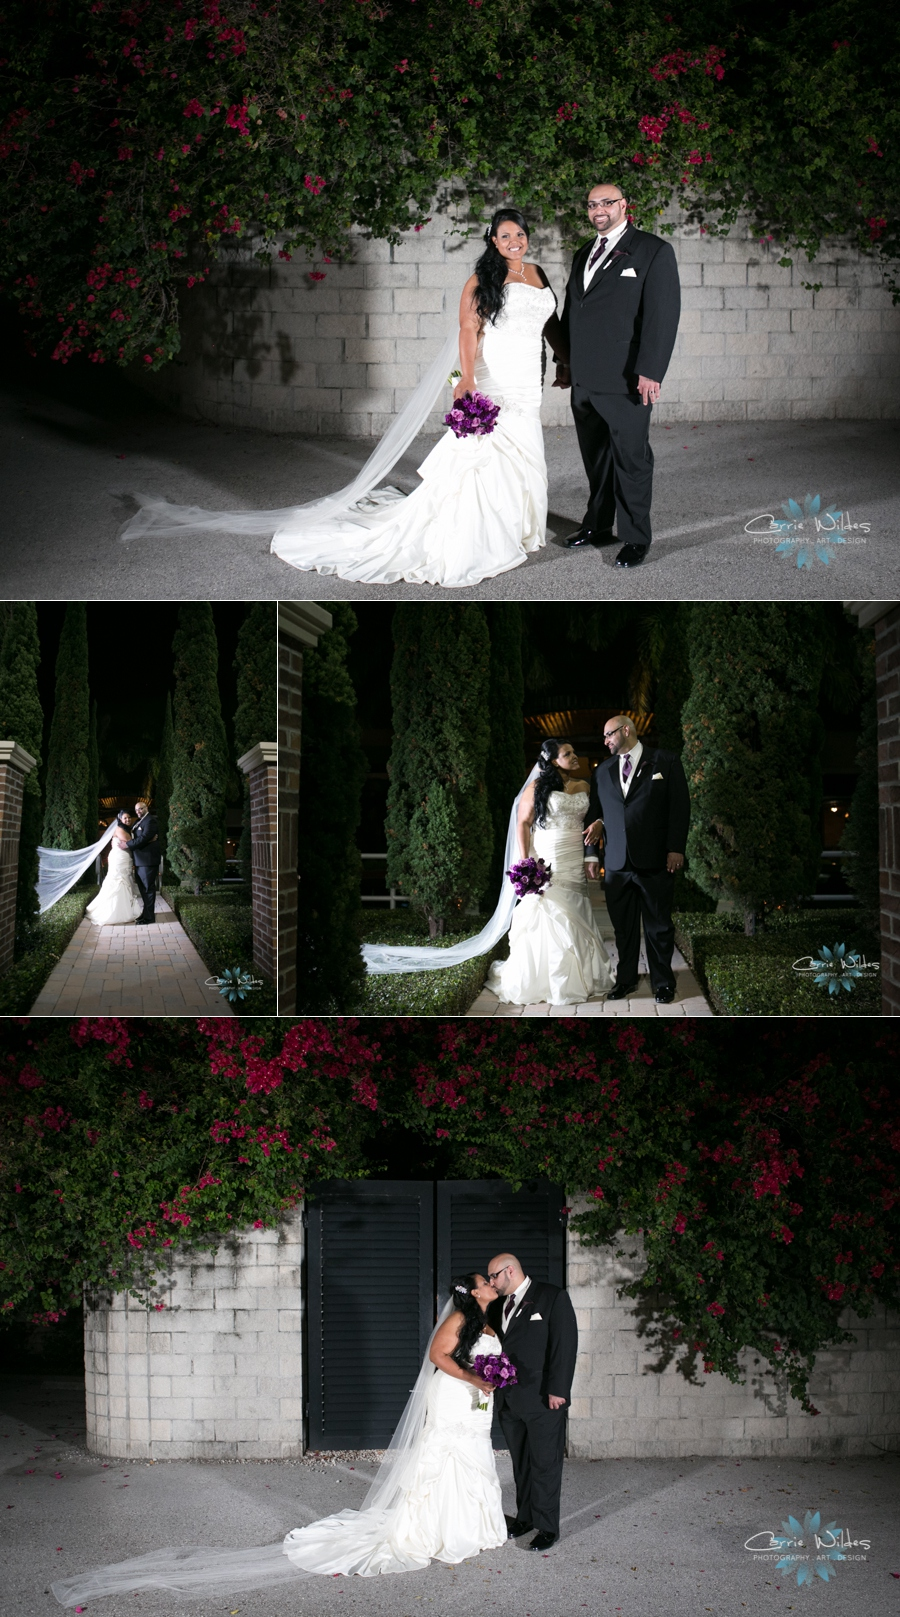 11_22_13 Pepin Hospitality Center Wedding_0009.jpg